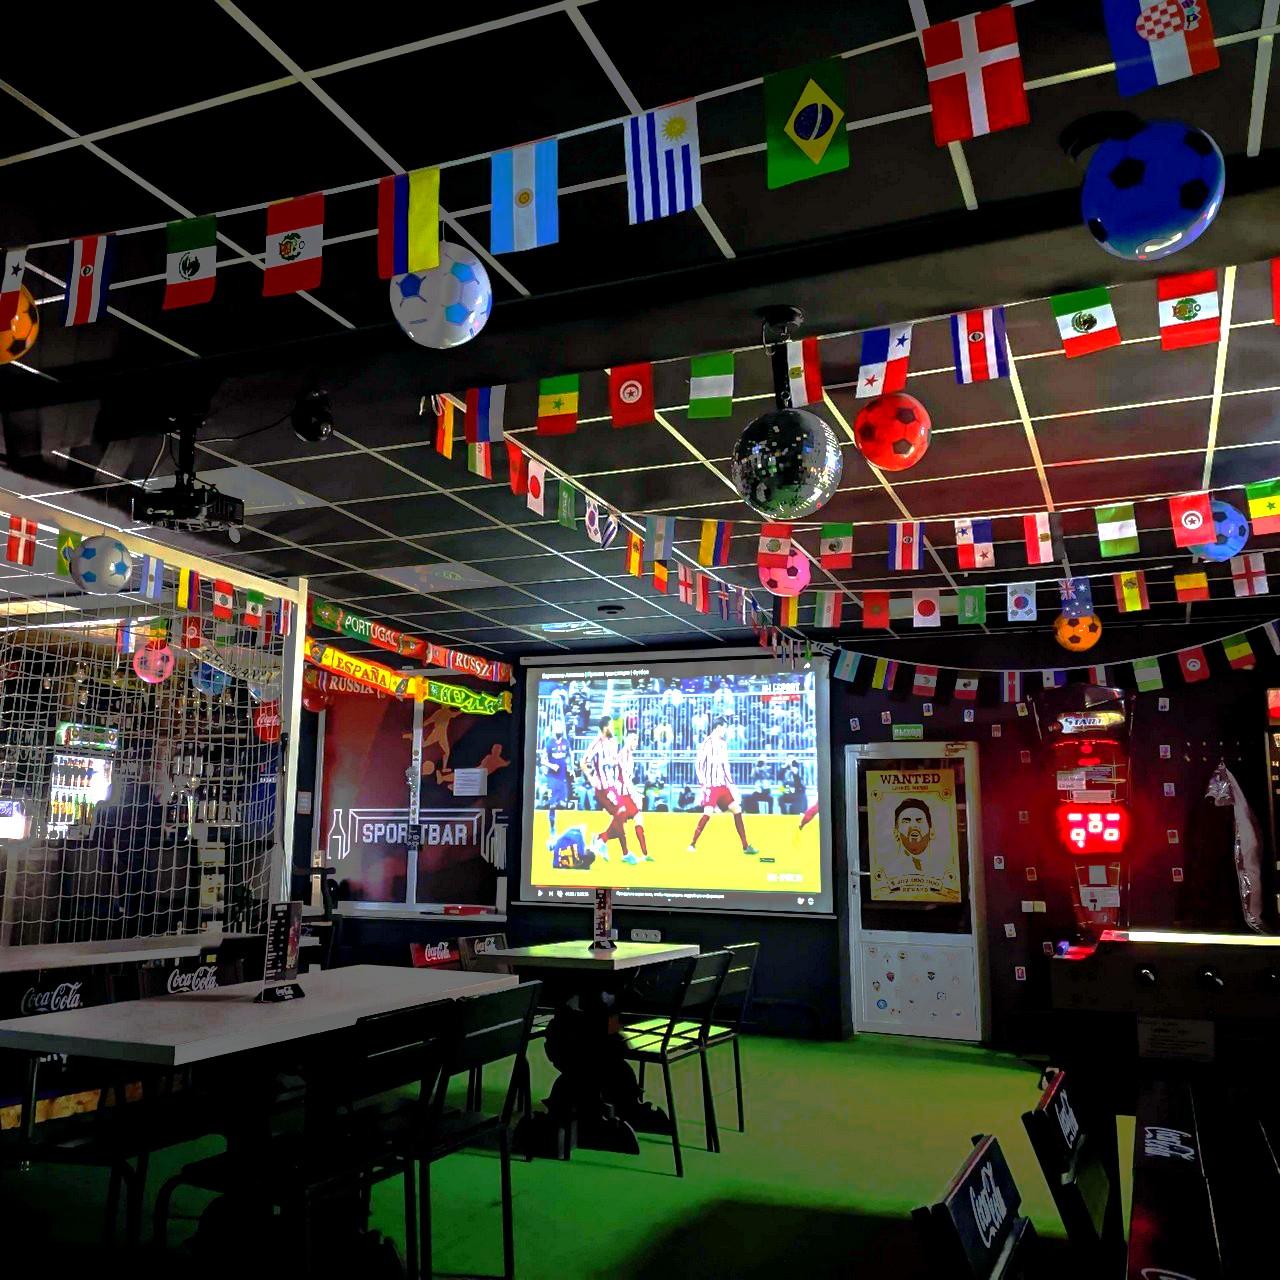 трансляция футбола в баре_crossbar_minsk